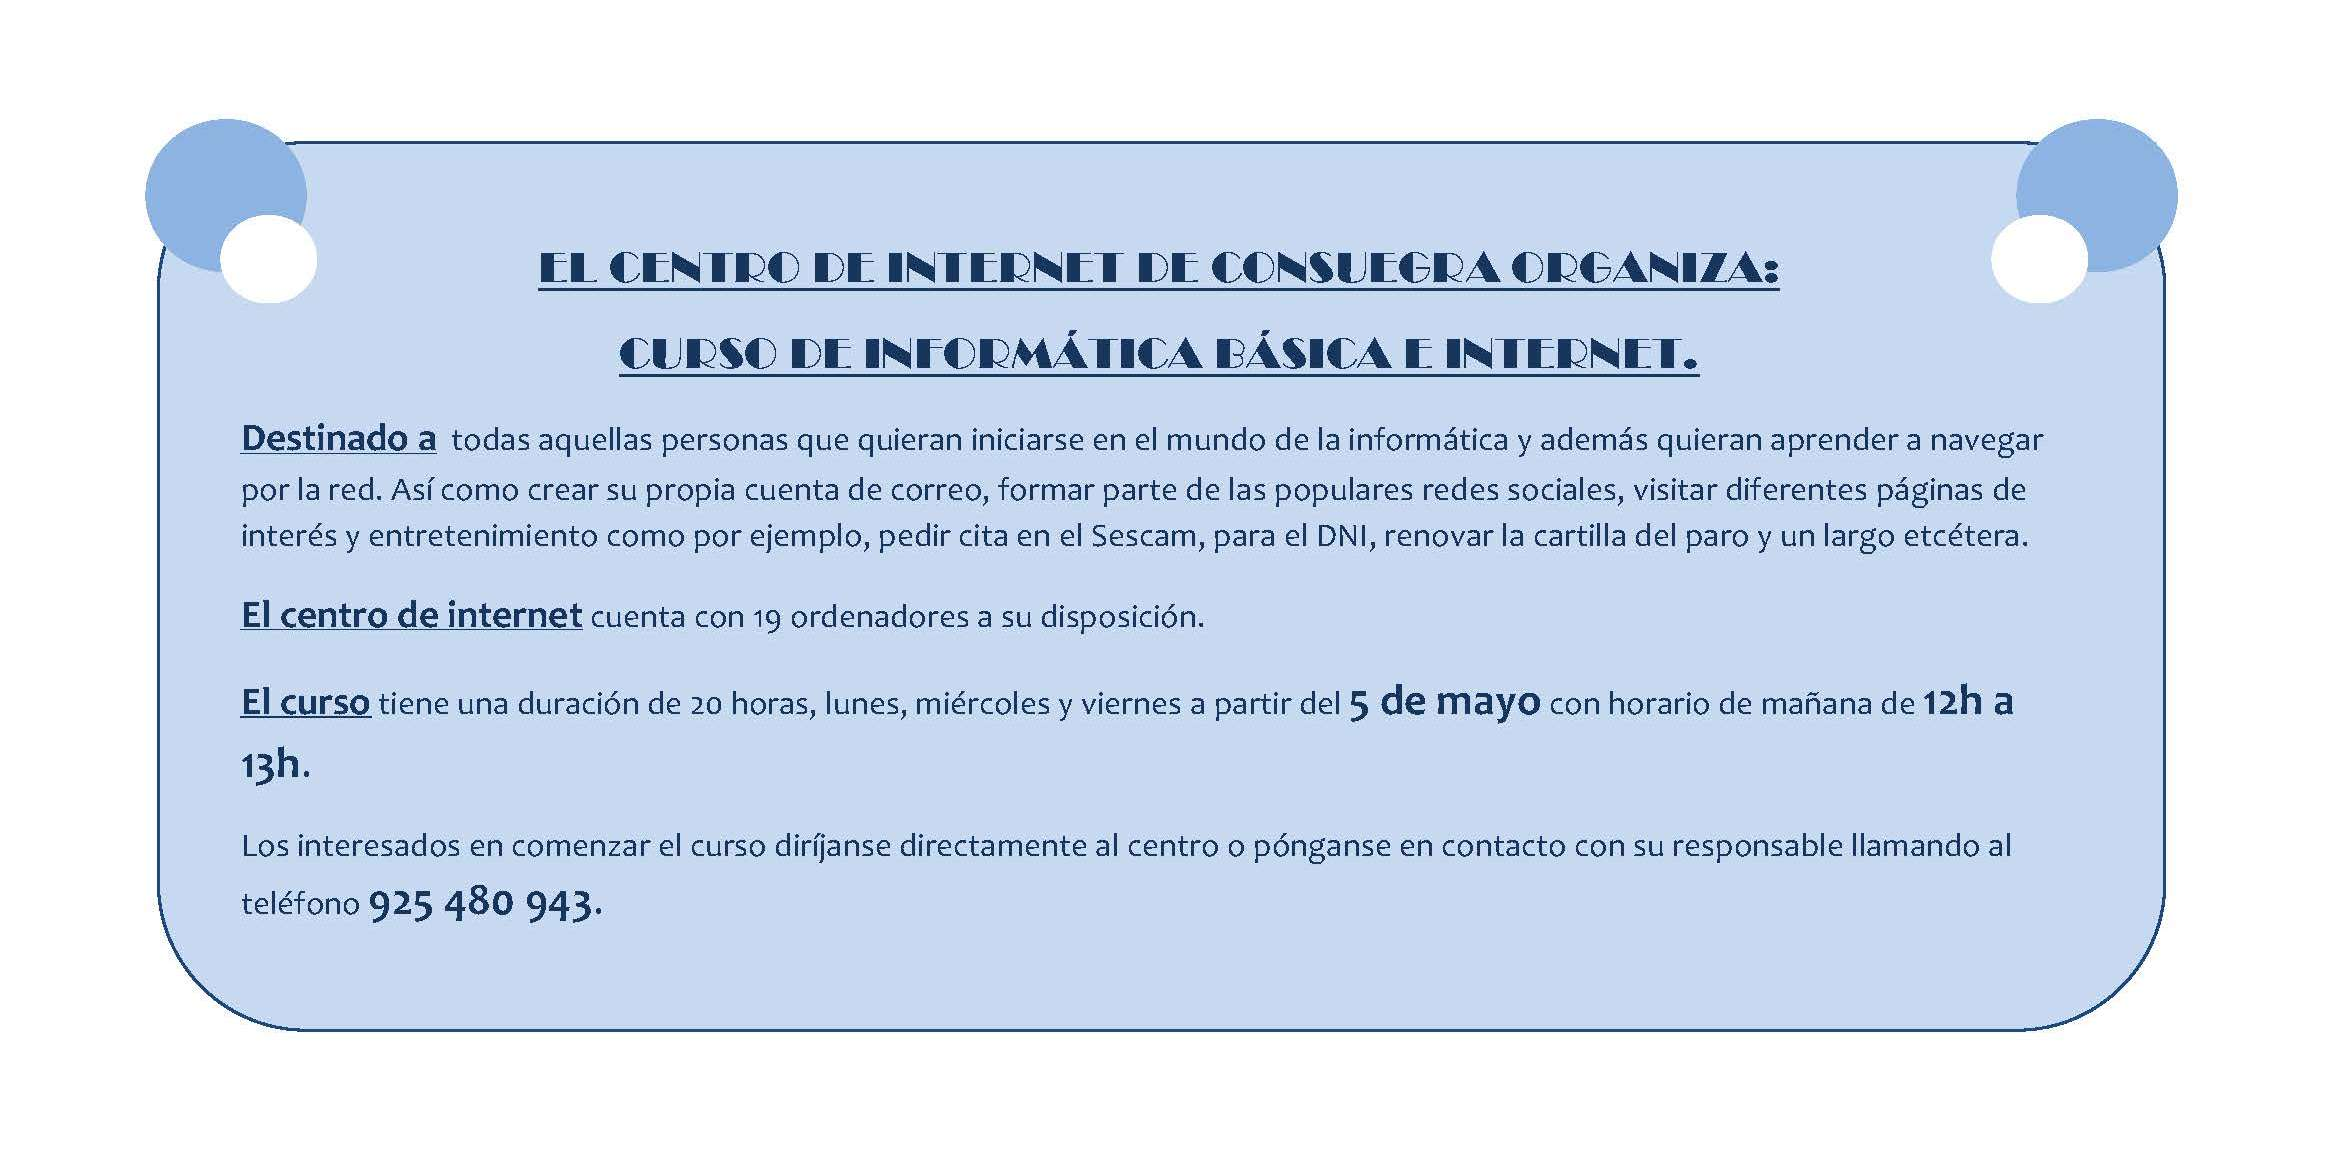 curso-informatica-centro-internet-2014-pag1.jpg - 172.91 KB